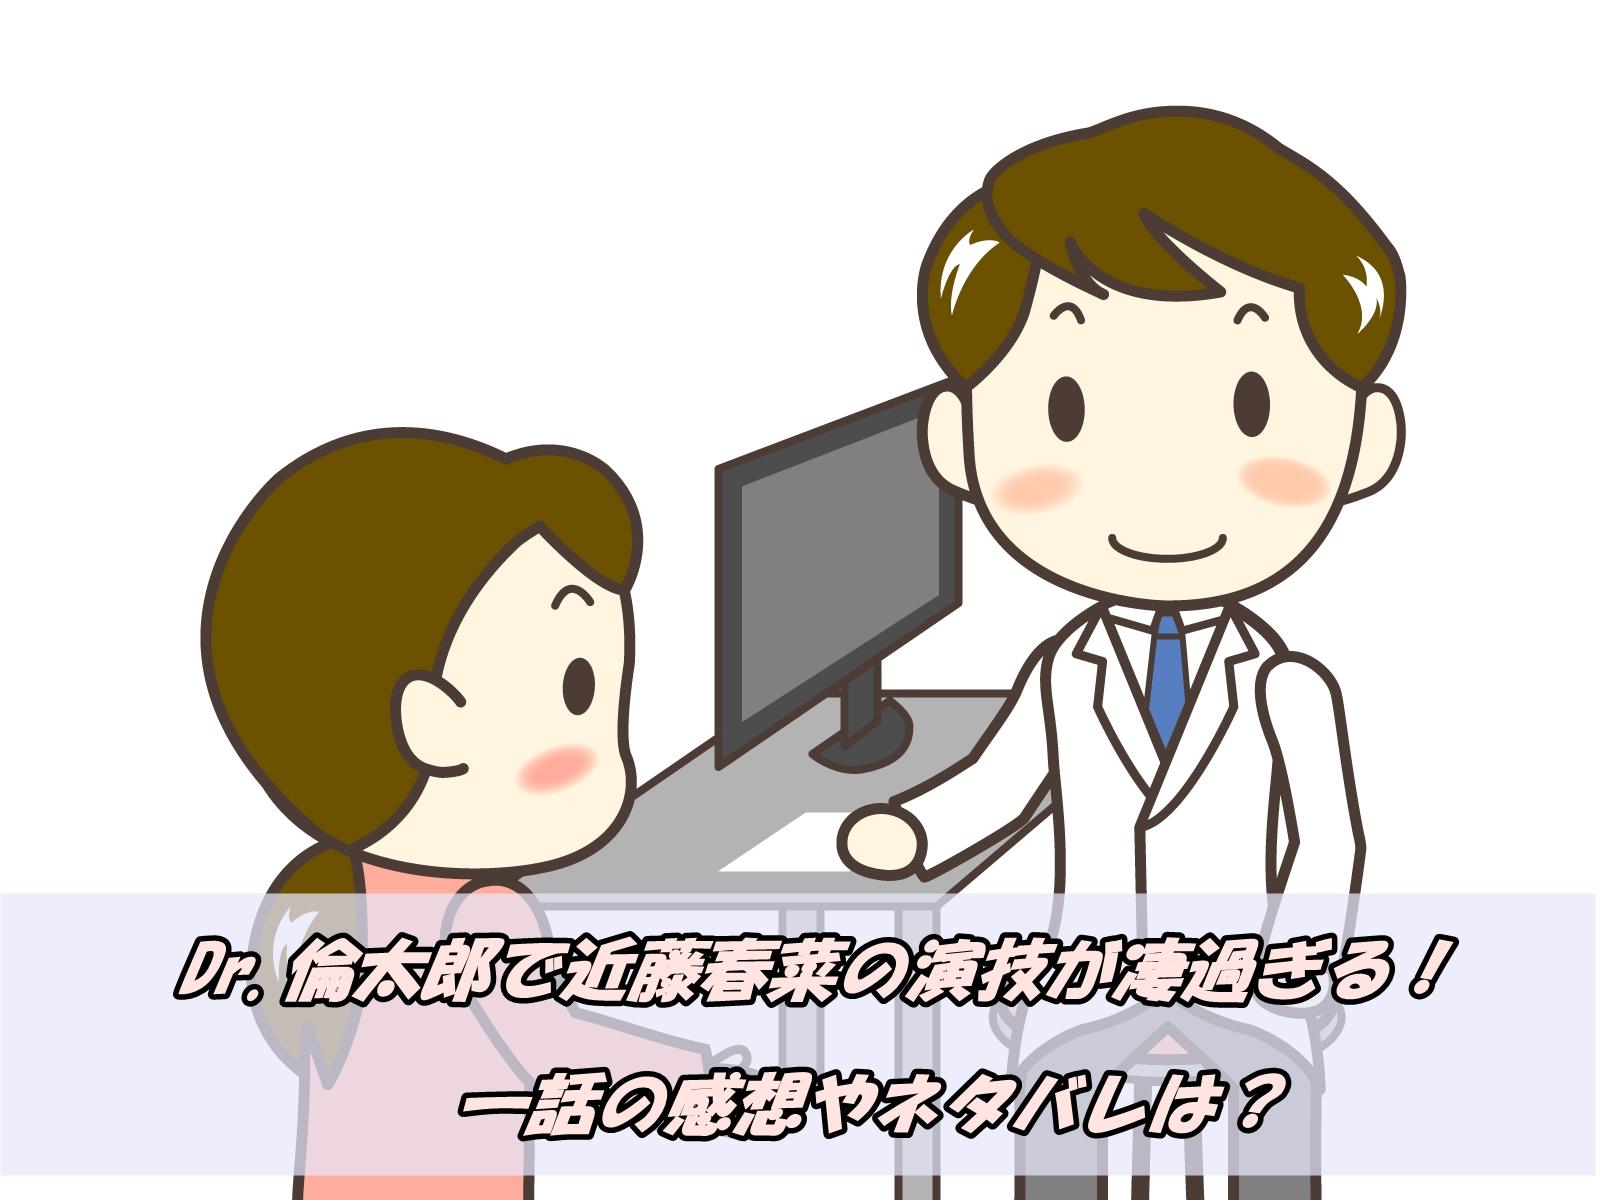 Dr.倫太郎で近藤春菜の演技が凄過ぎる!一話の感想やネタバレは?